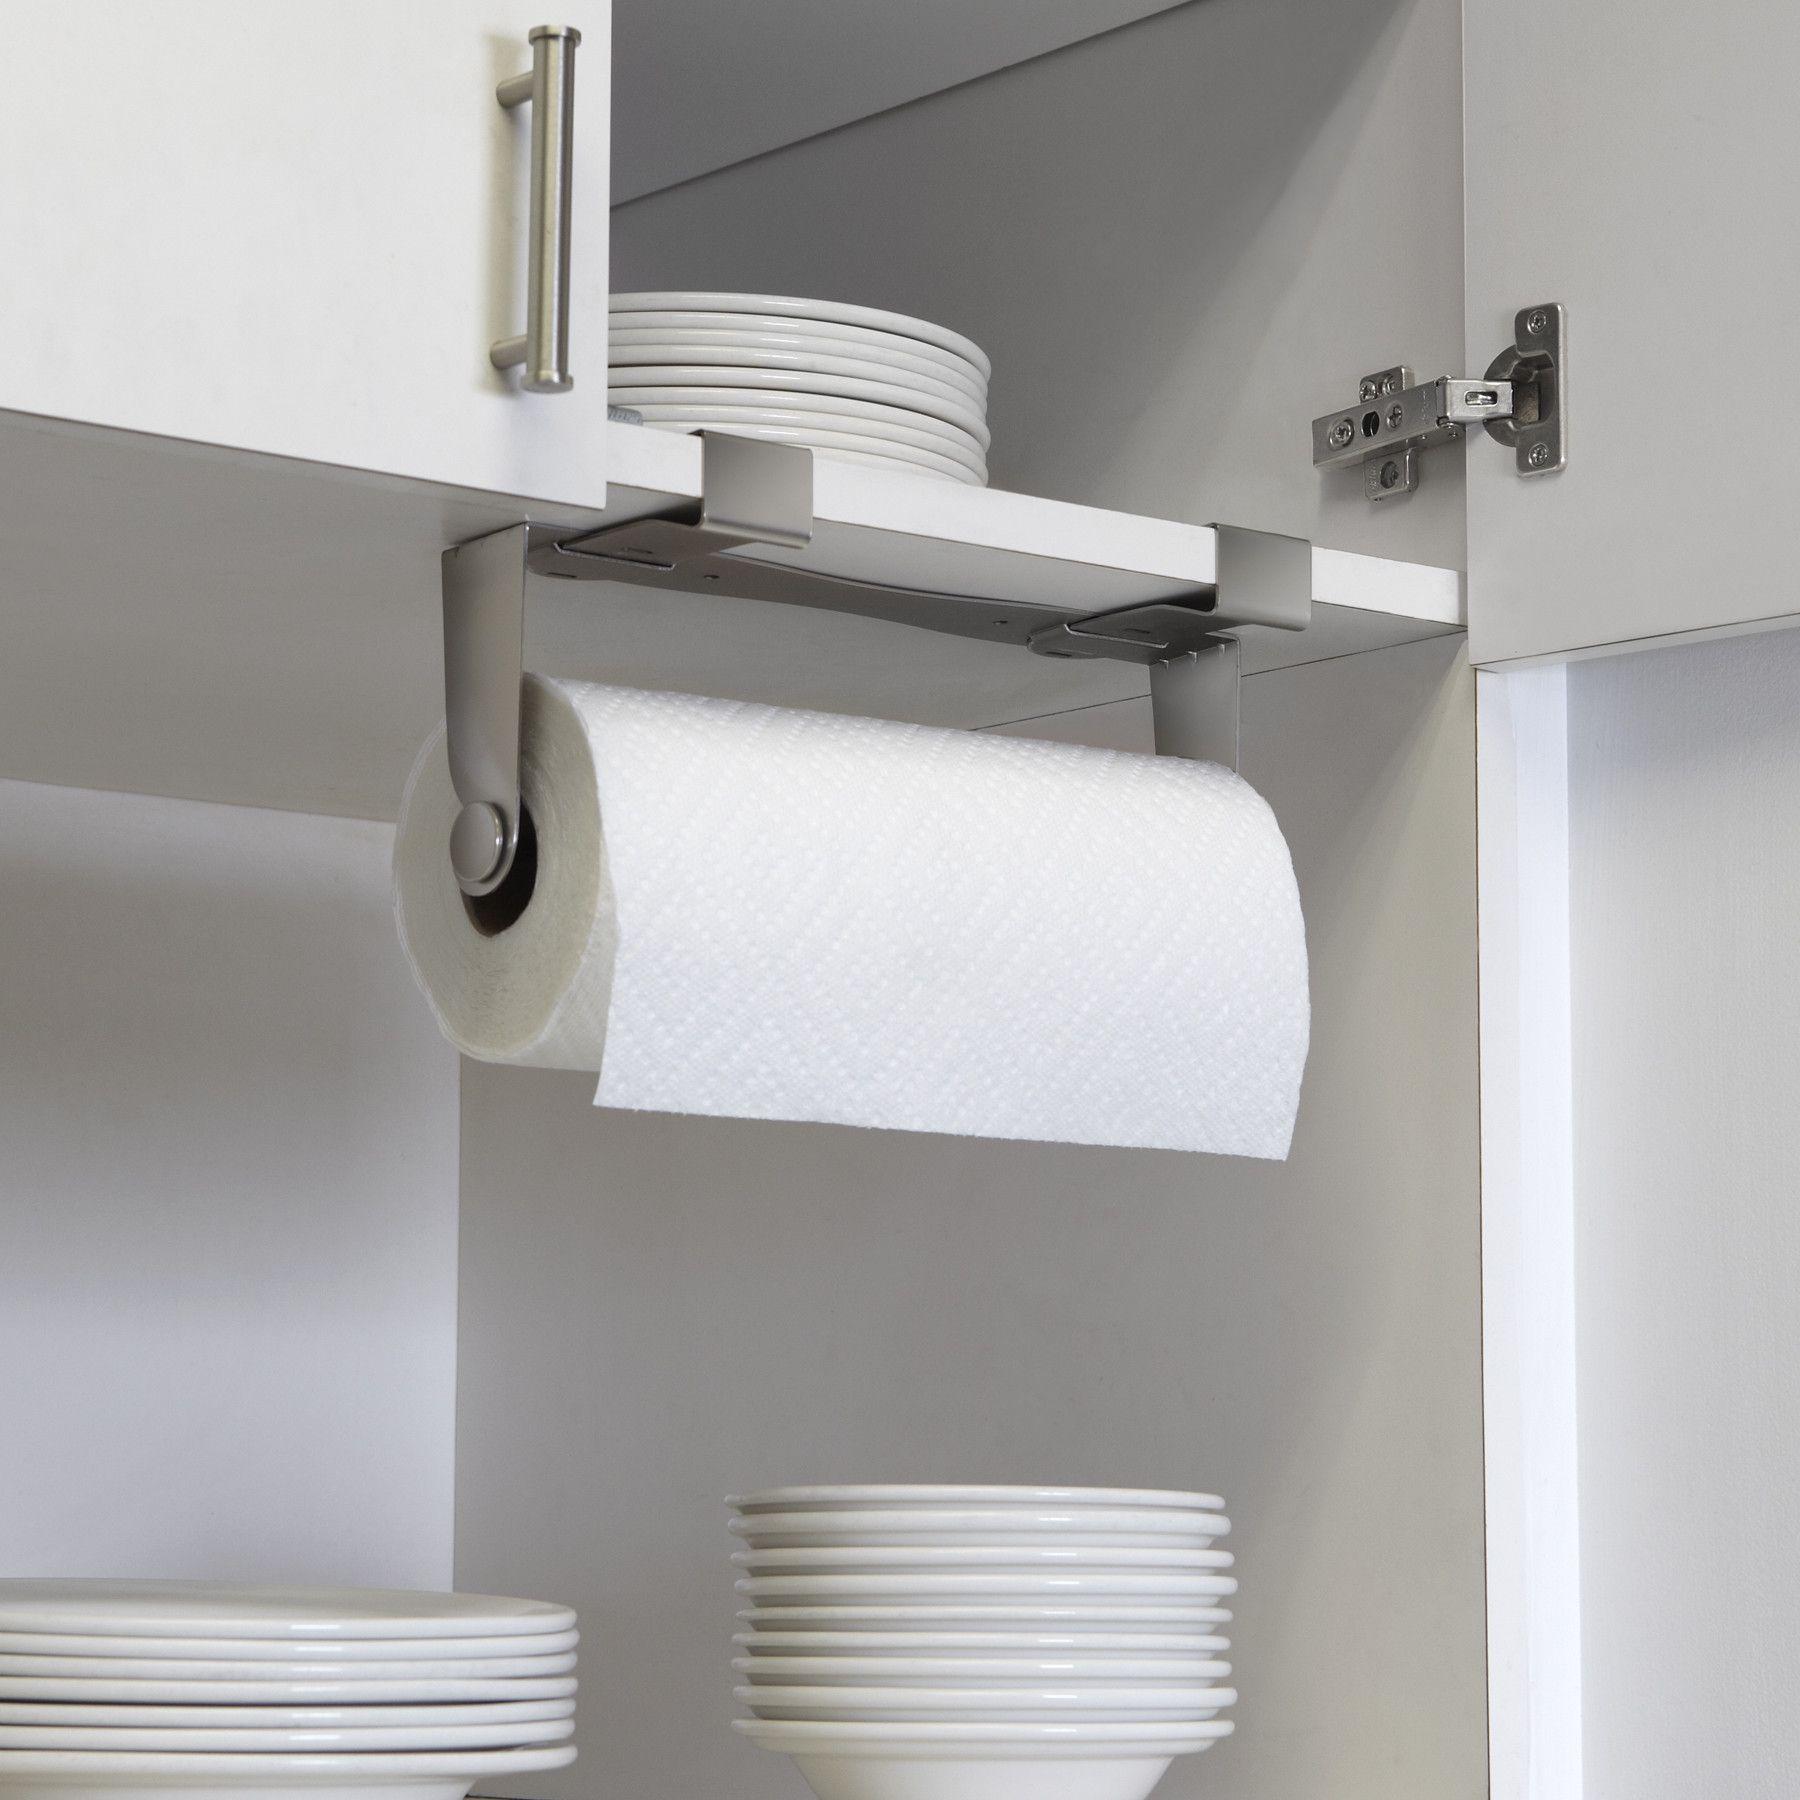 Umbra Mountie Paper Towel Holder Paper Towel Holder Kitchen Kitchen Towel Holder Paper Towel Holder